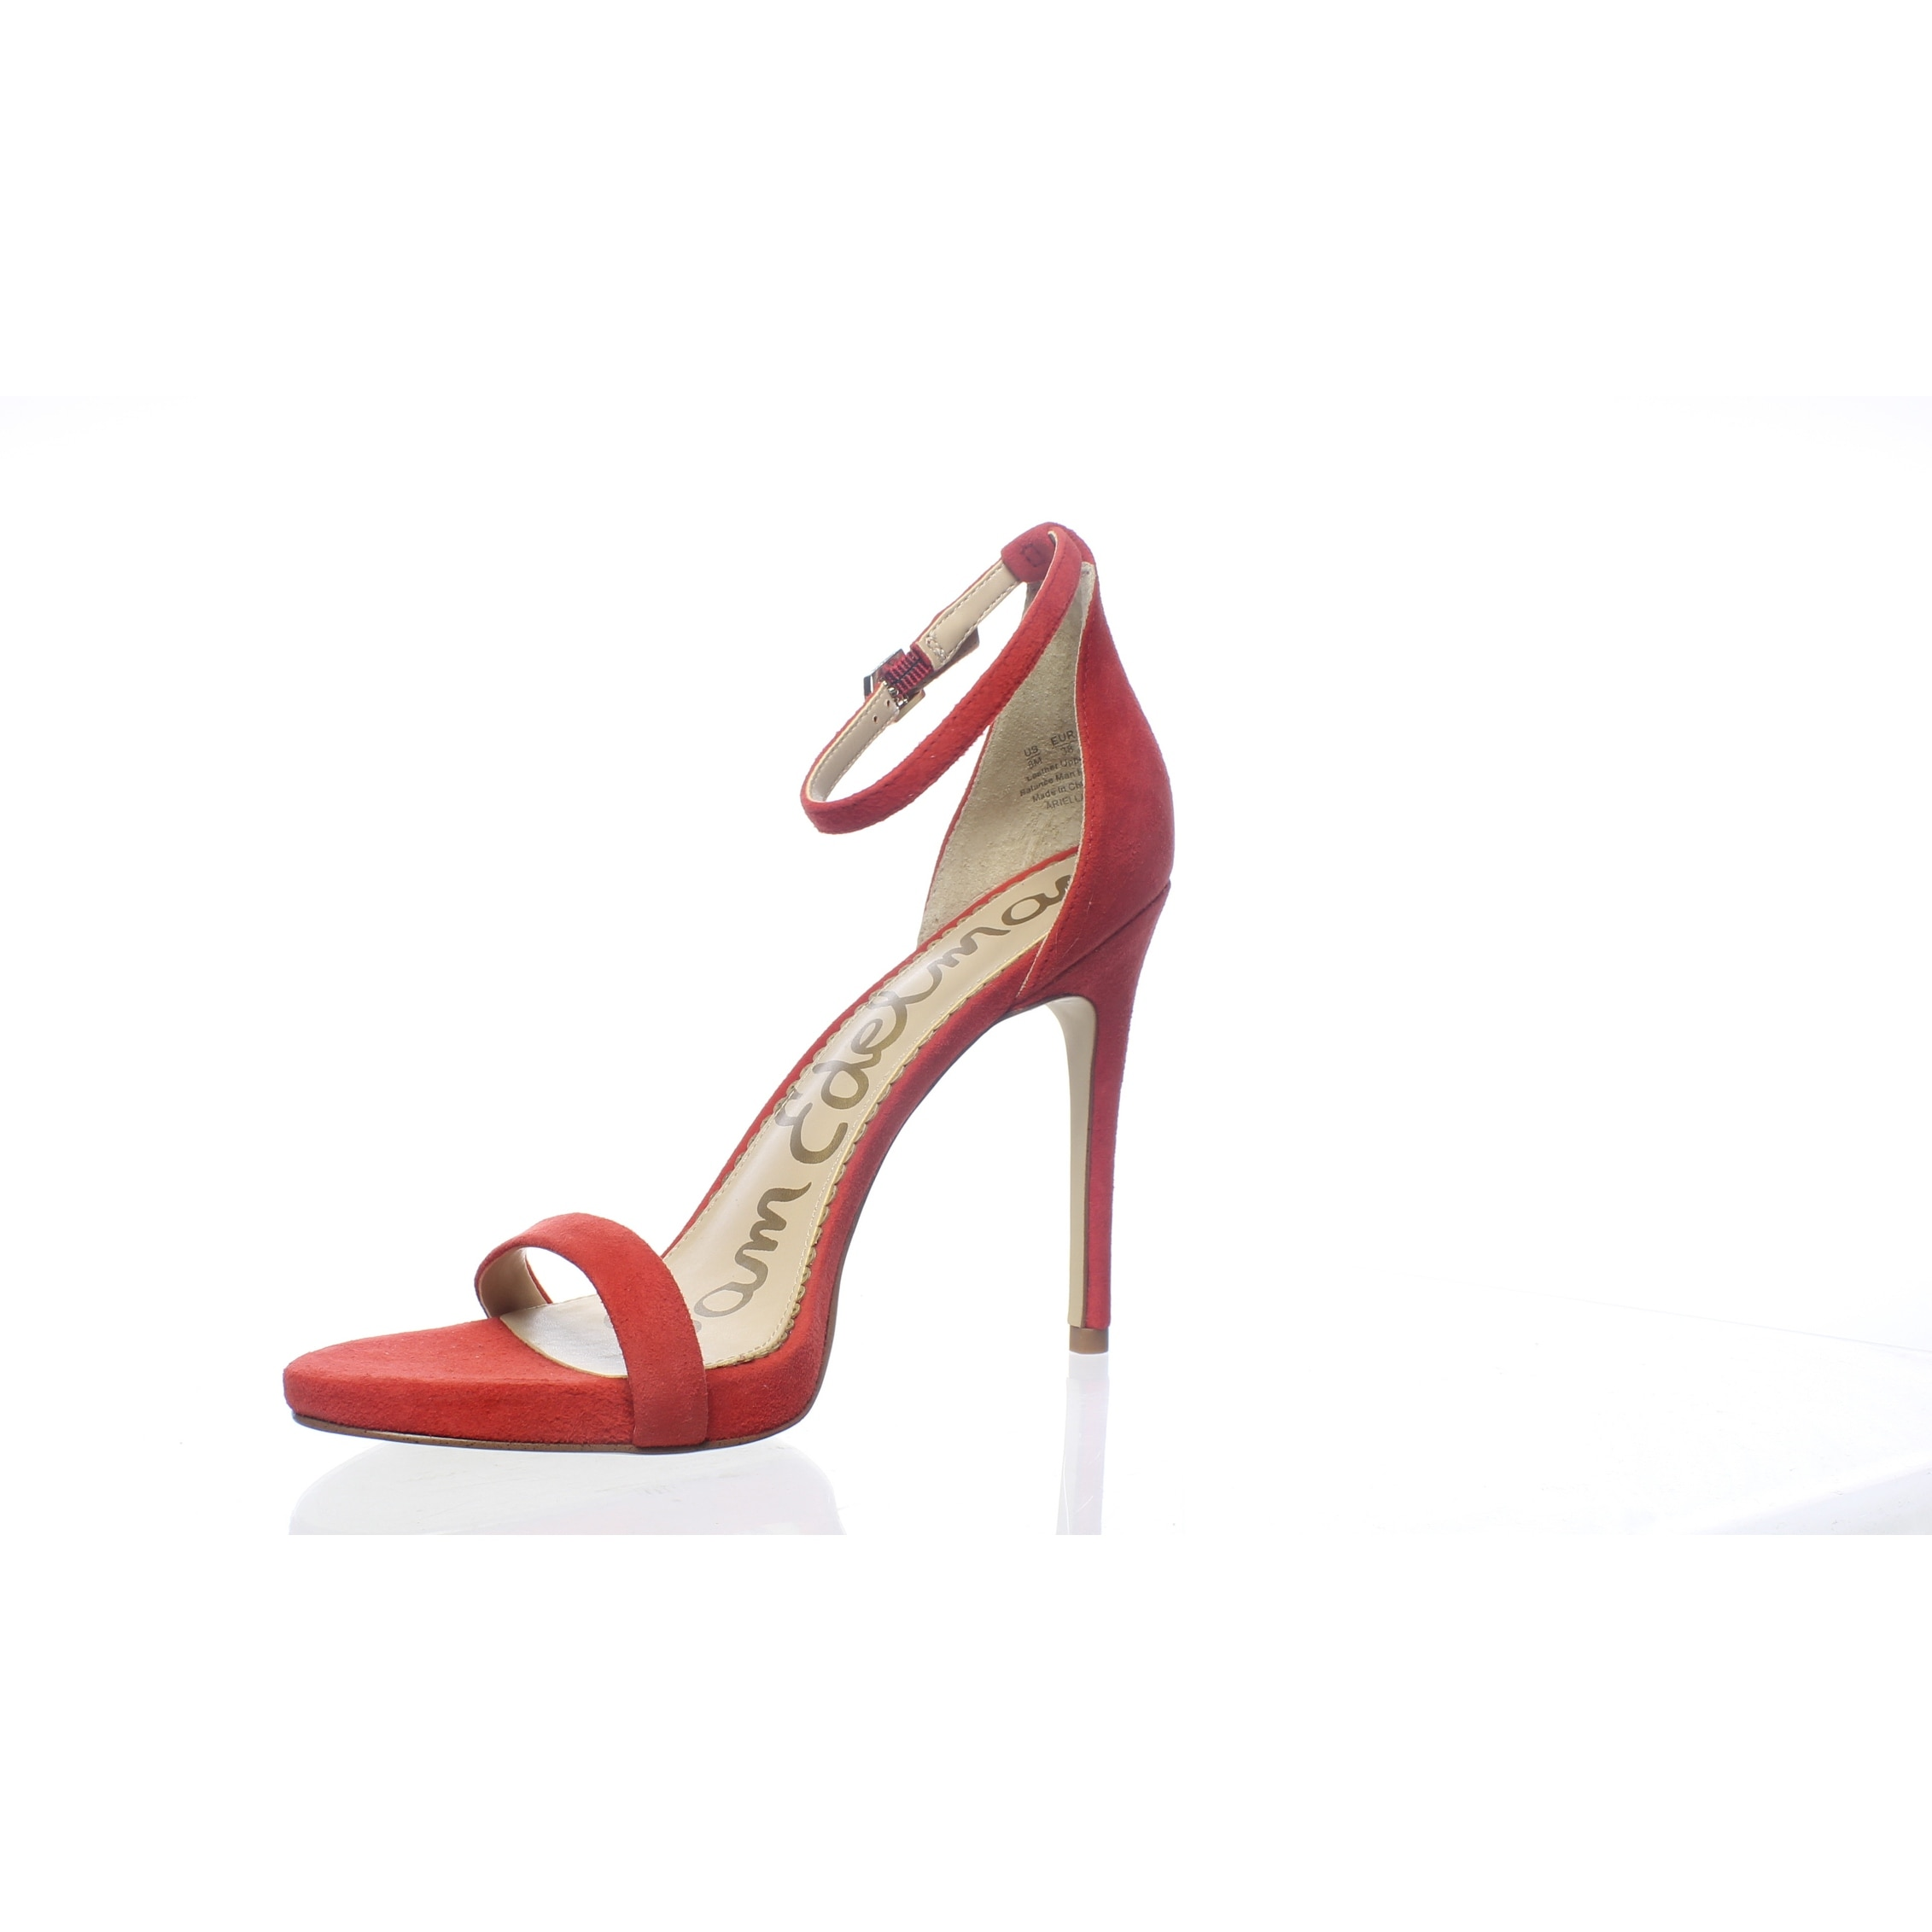 4d91d4d01c7 Sam Edelman Womens Ariella Candy Red Ankle Strap Heels Size 8